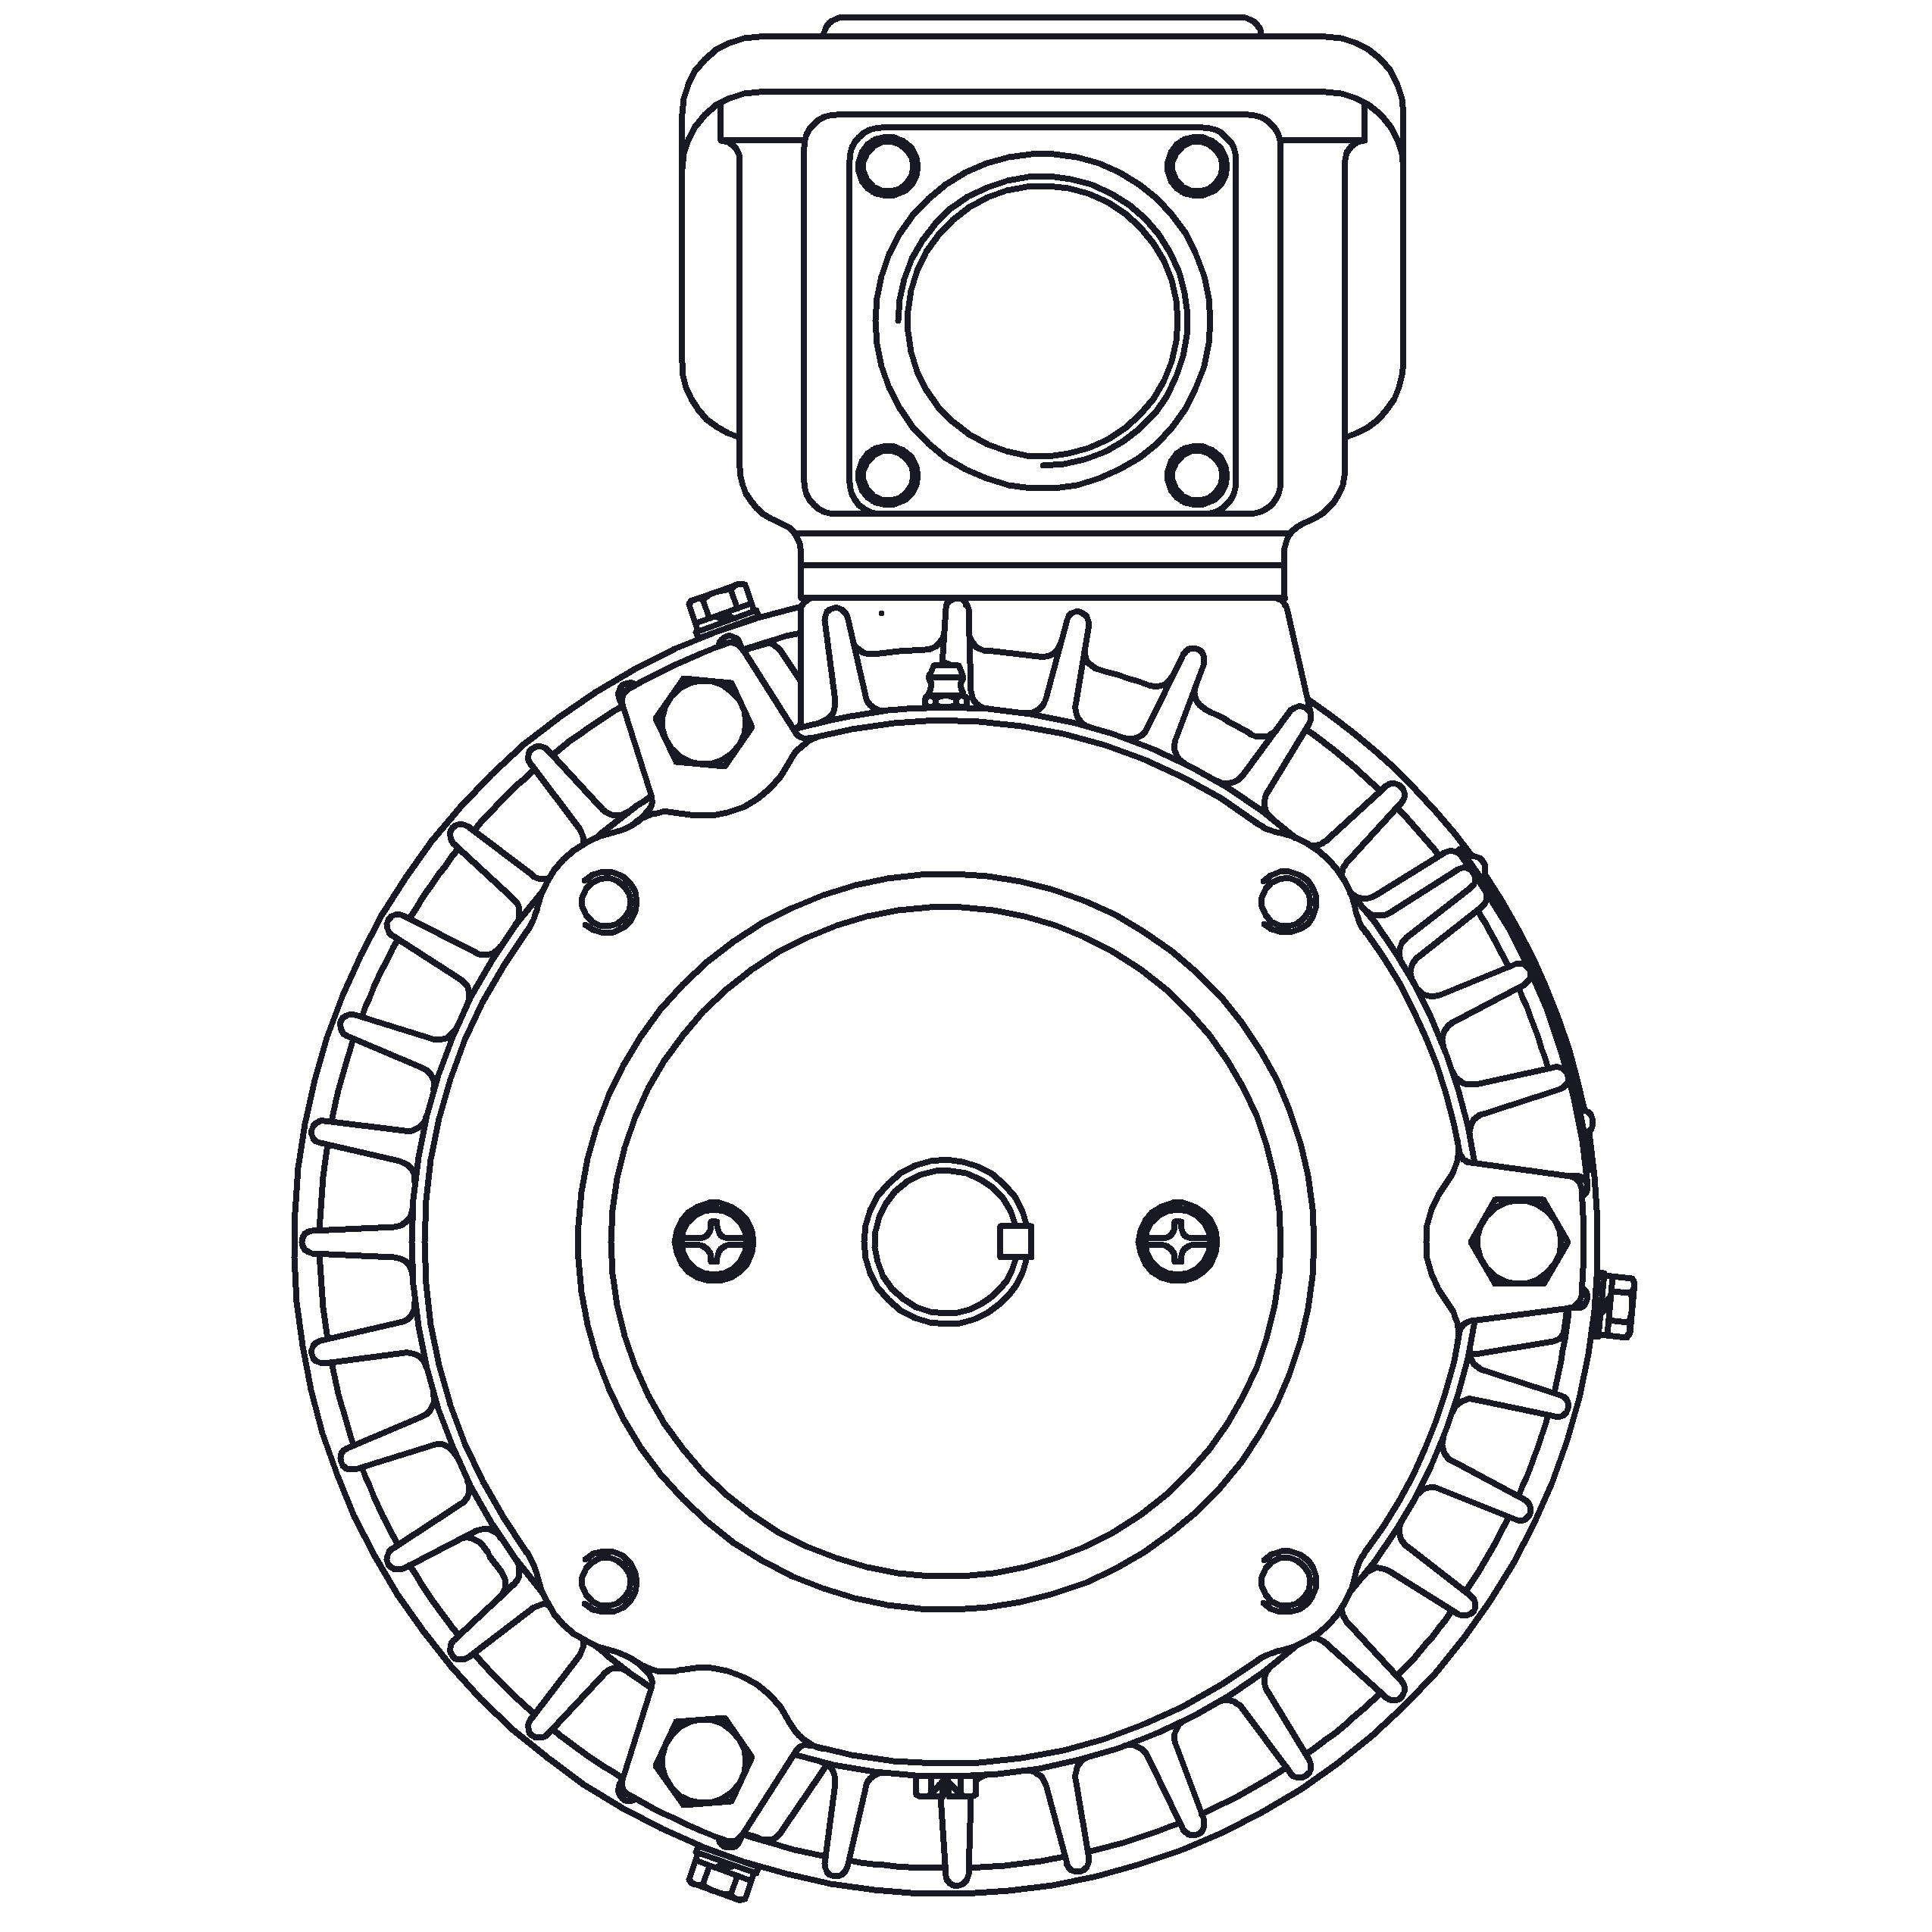 HBV1/52C Teco-Westinghouse 1.5HP MAX-E2/841 Cast Iron